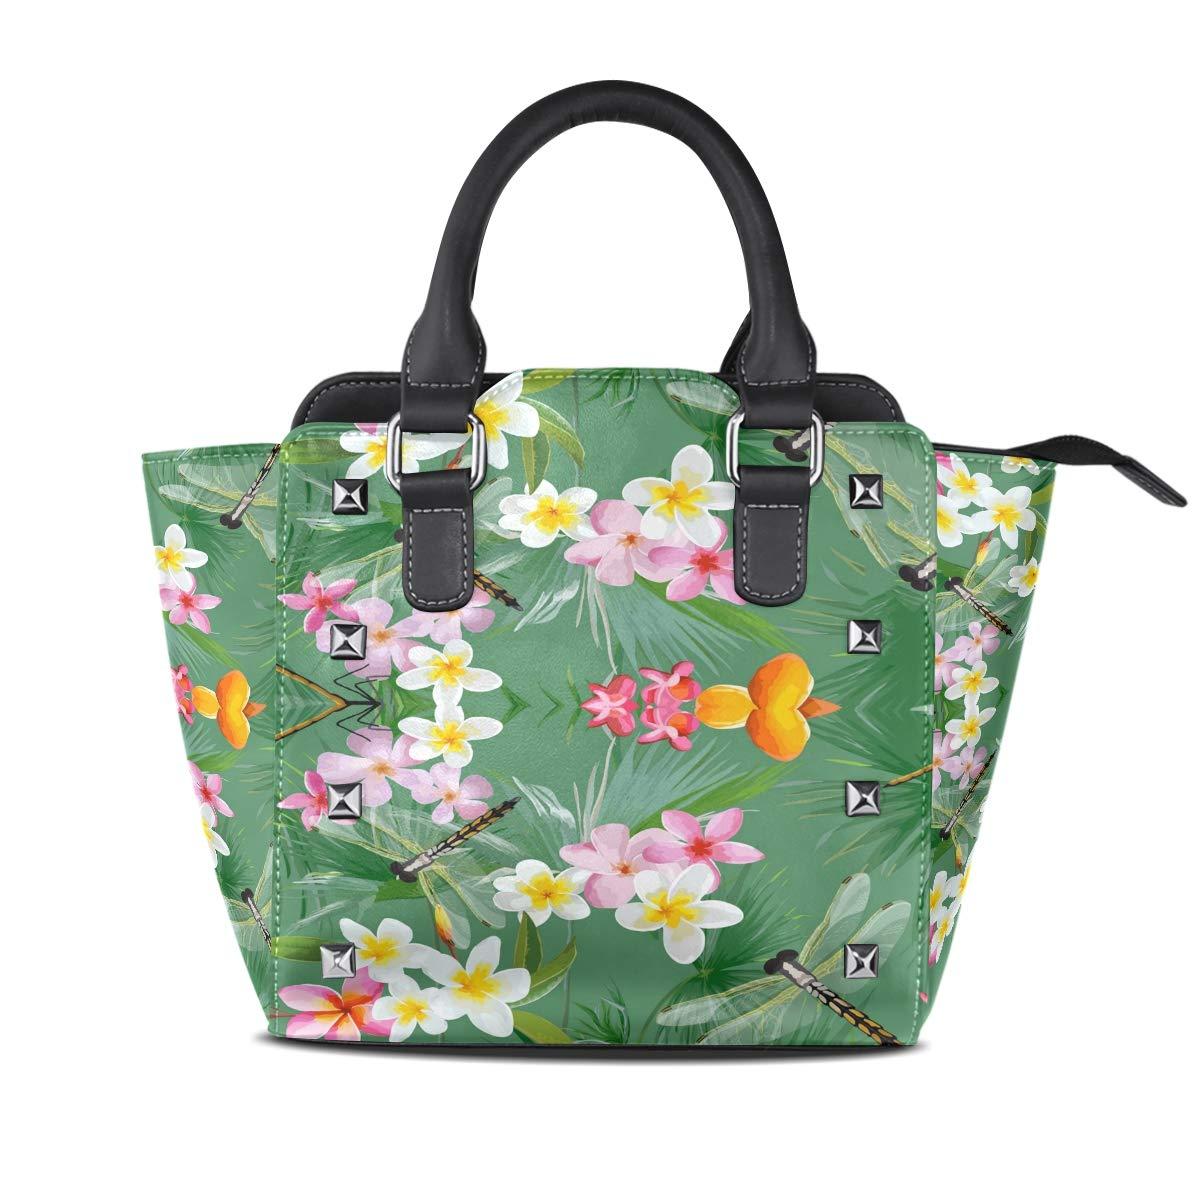 Design2 Handbag Unicorn Puts Rainbow Fart The Galaxy Genuine Leather Tote Rivet Bag Shoulder Strap Top Handle Women